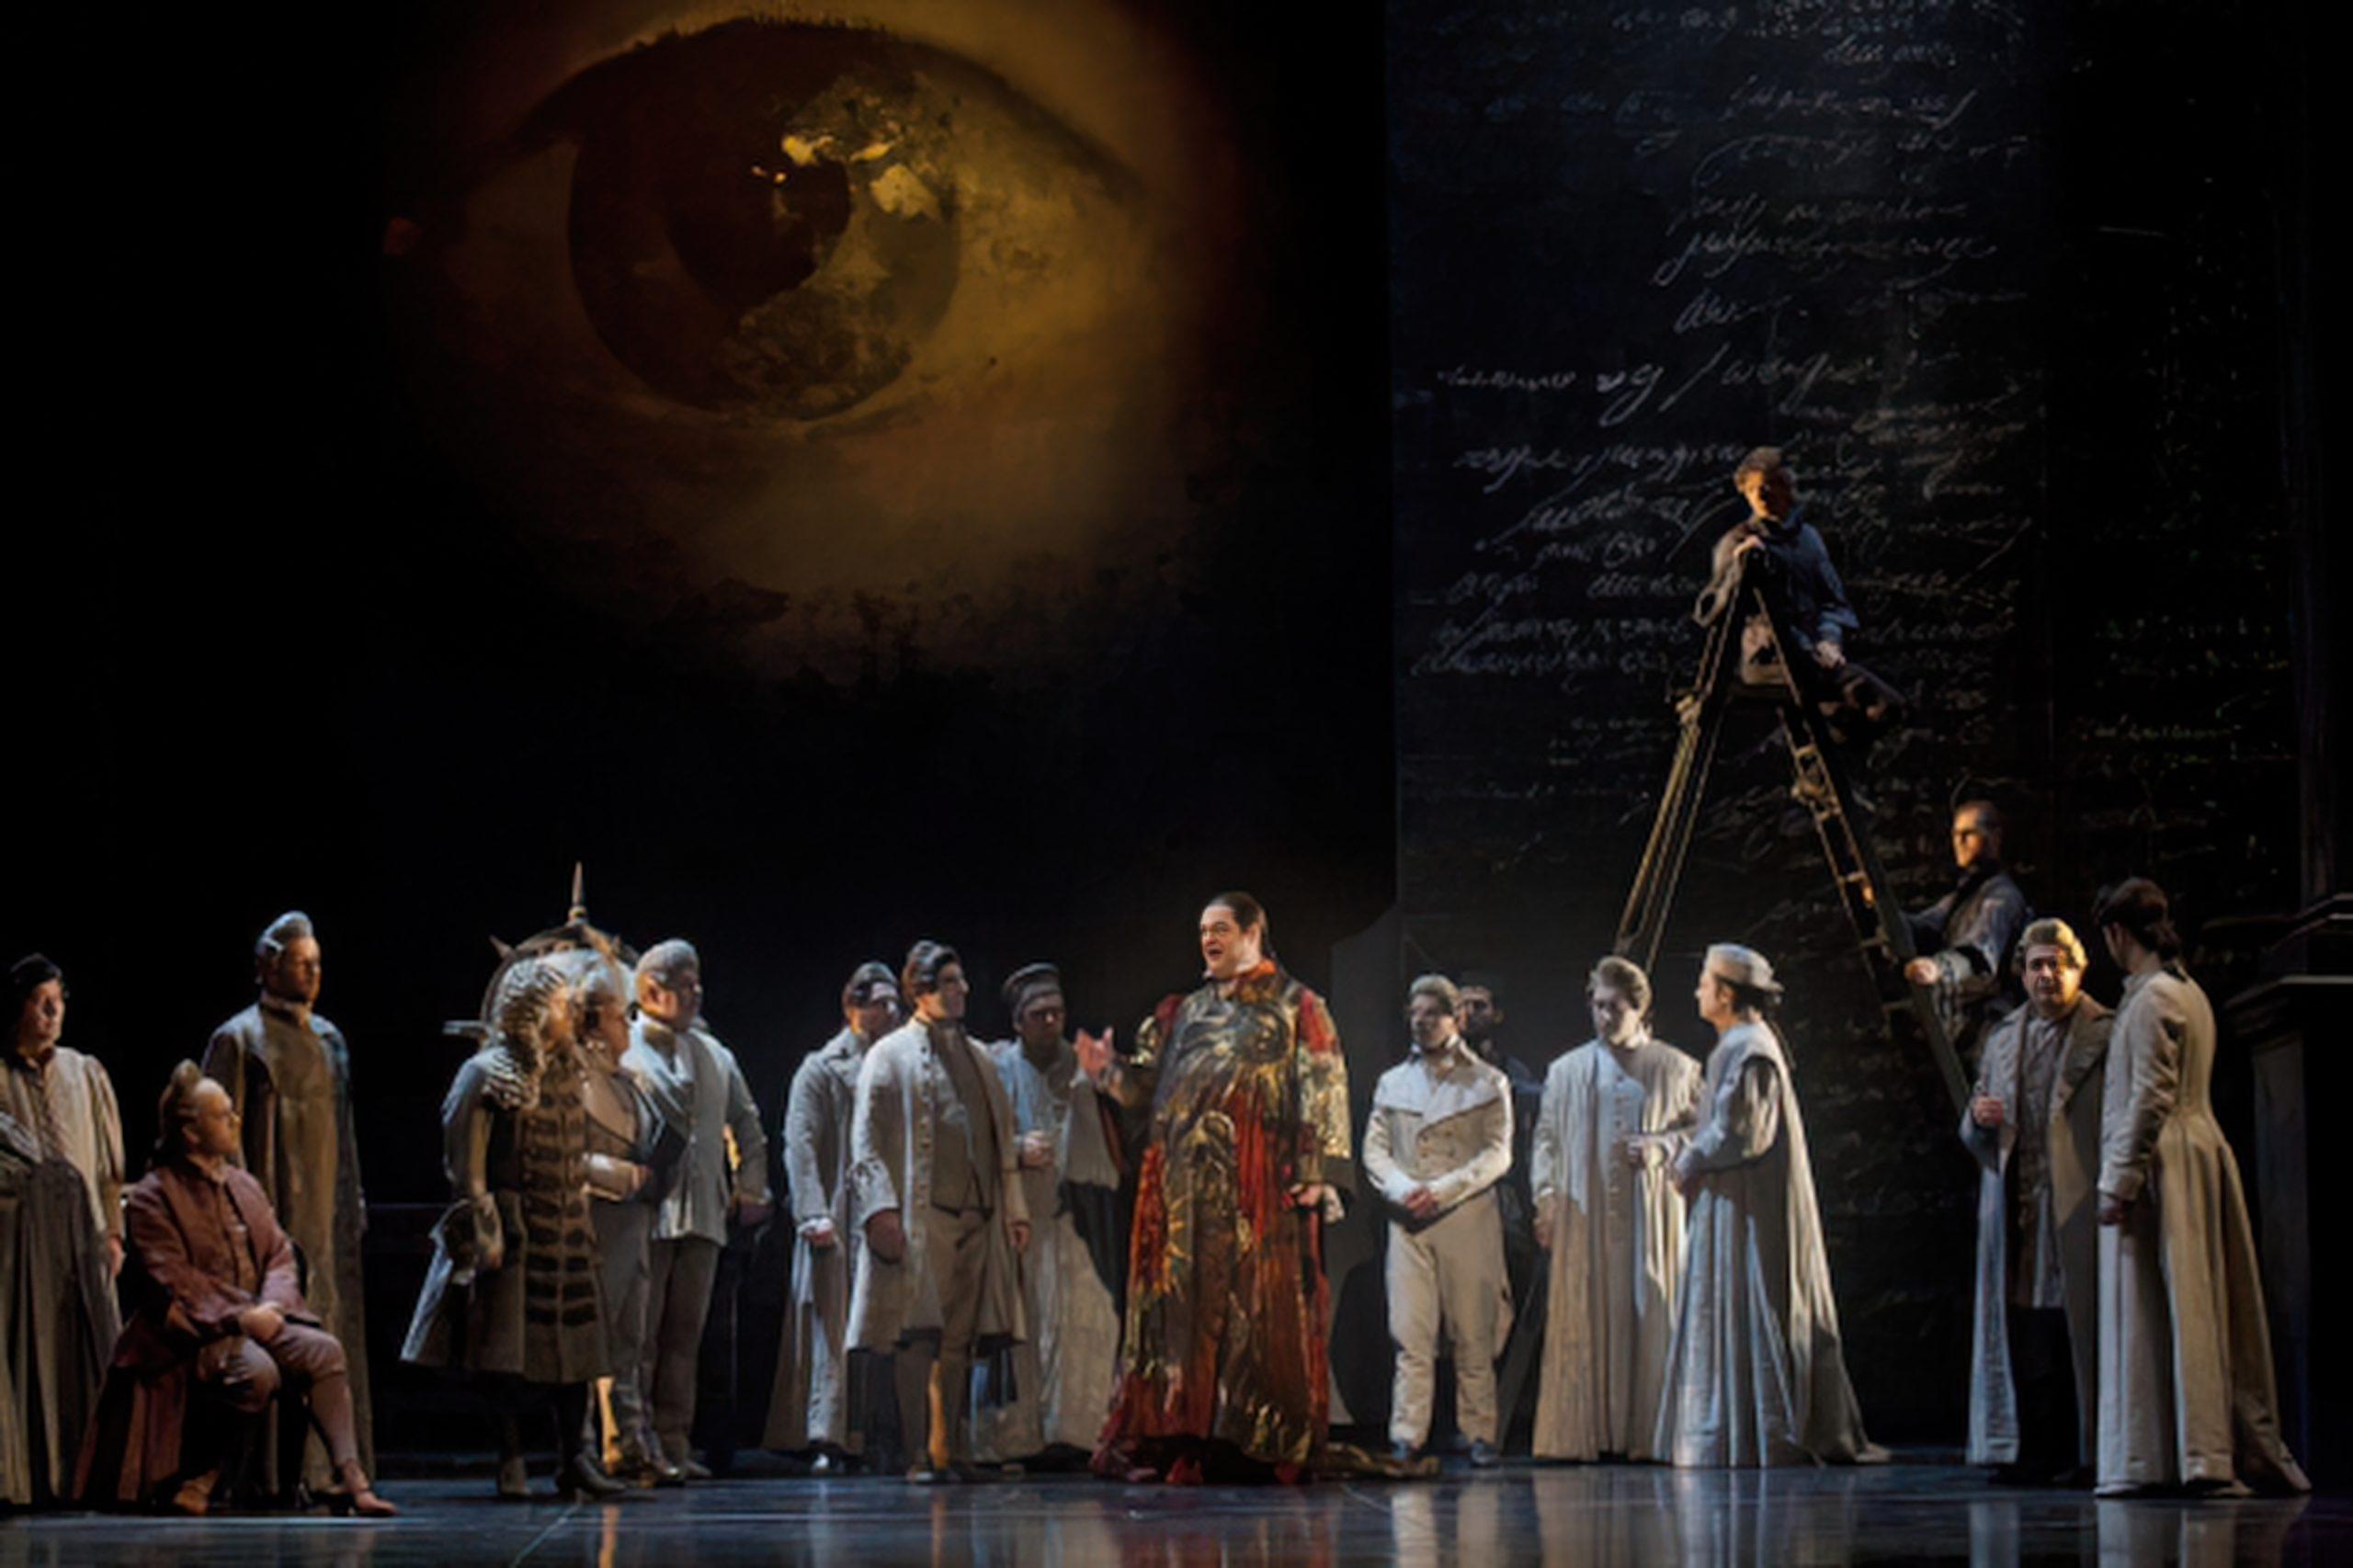 Sarastro/Zauberflöte - Teatro dell'Opera Rom.